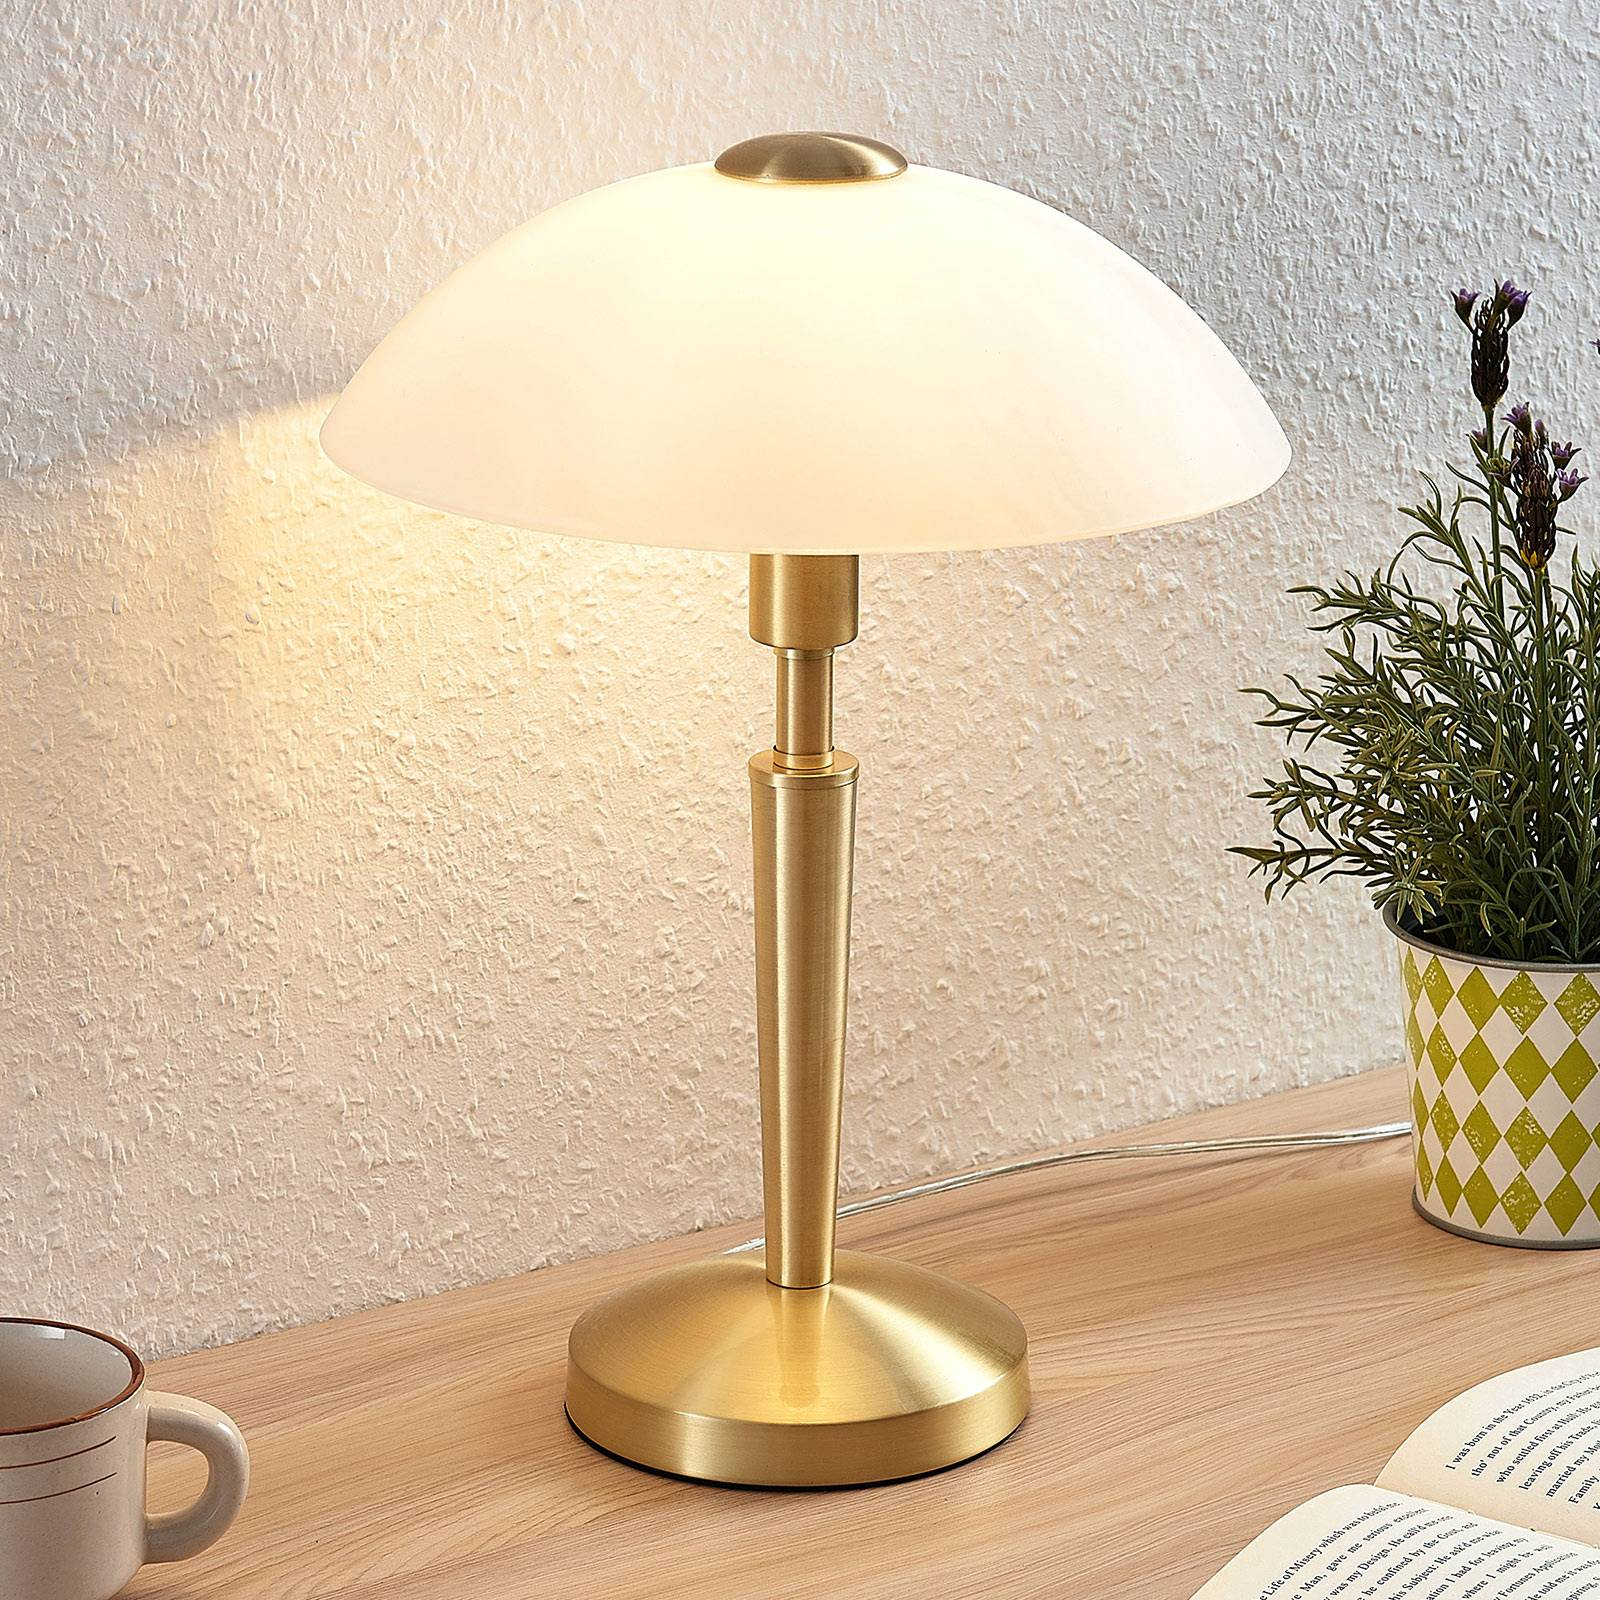 Tafellamp Tibby met glazen lampenkap in ant mess